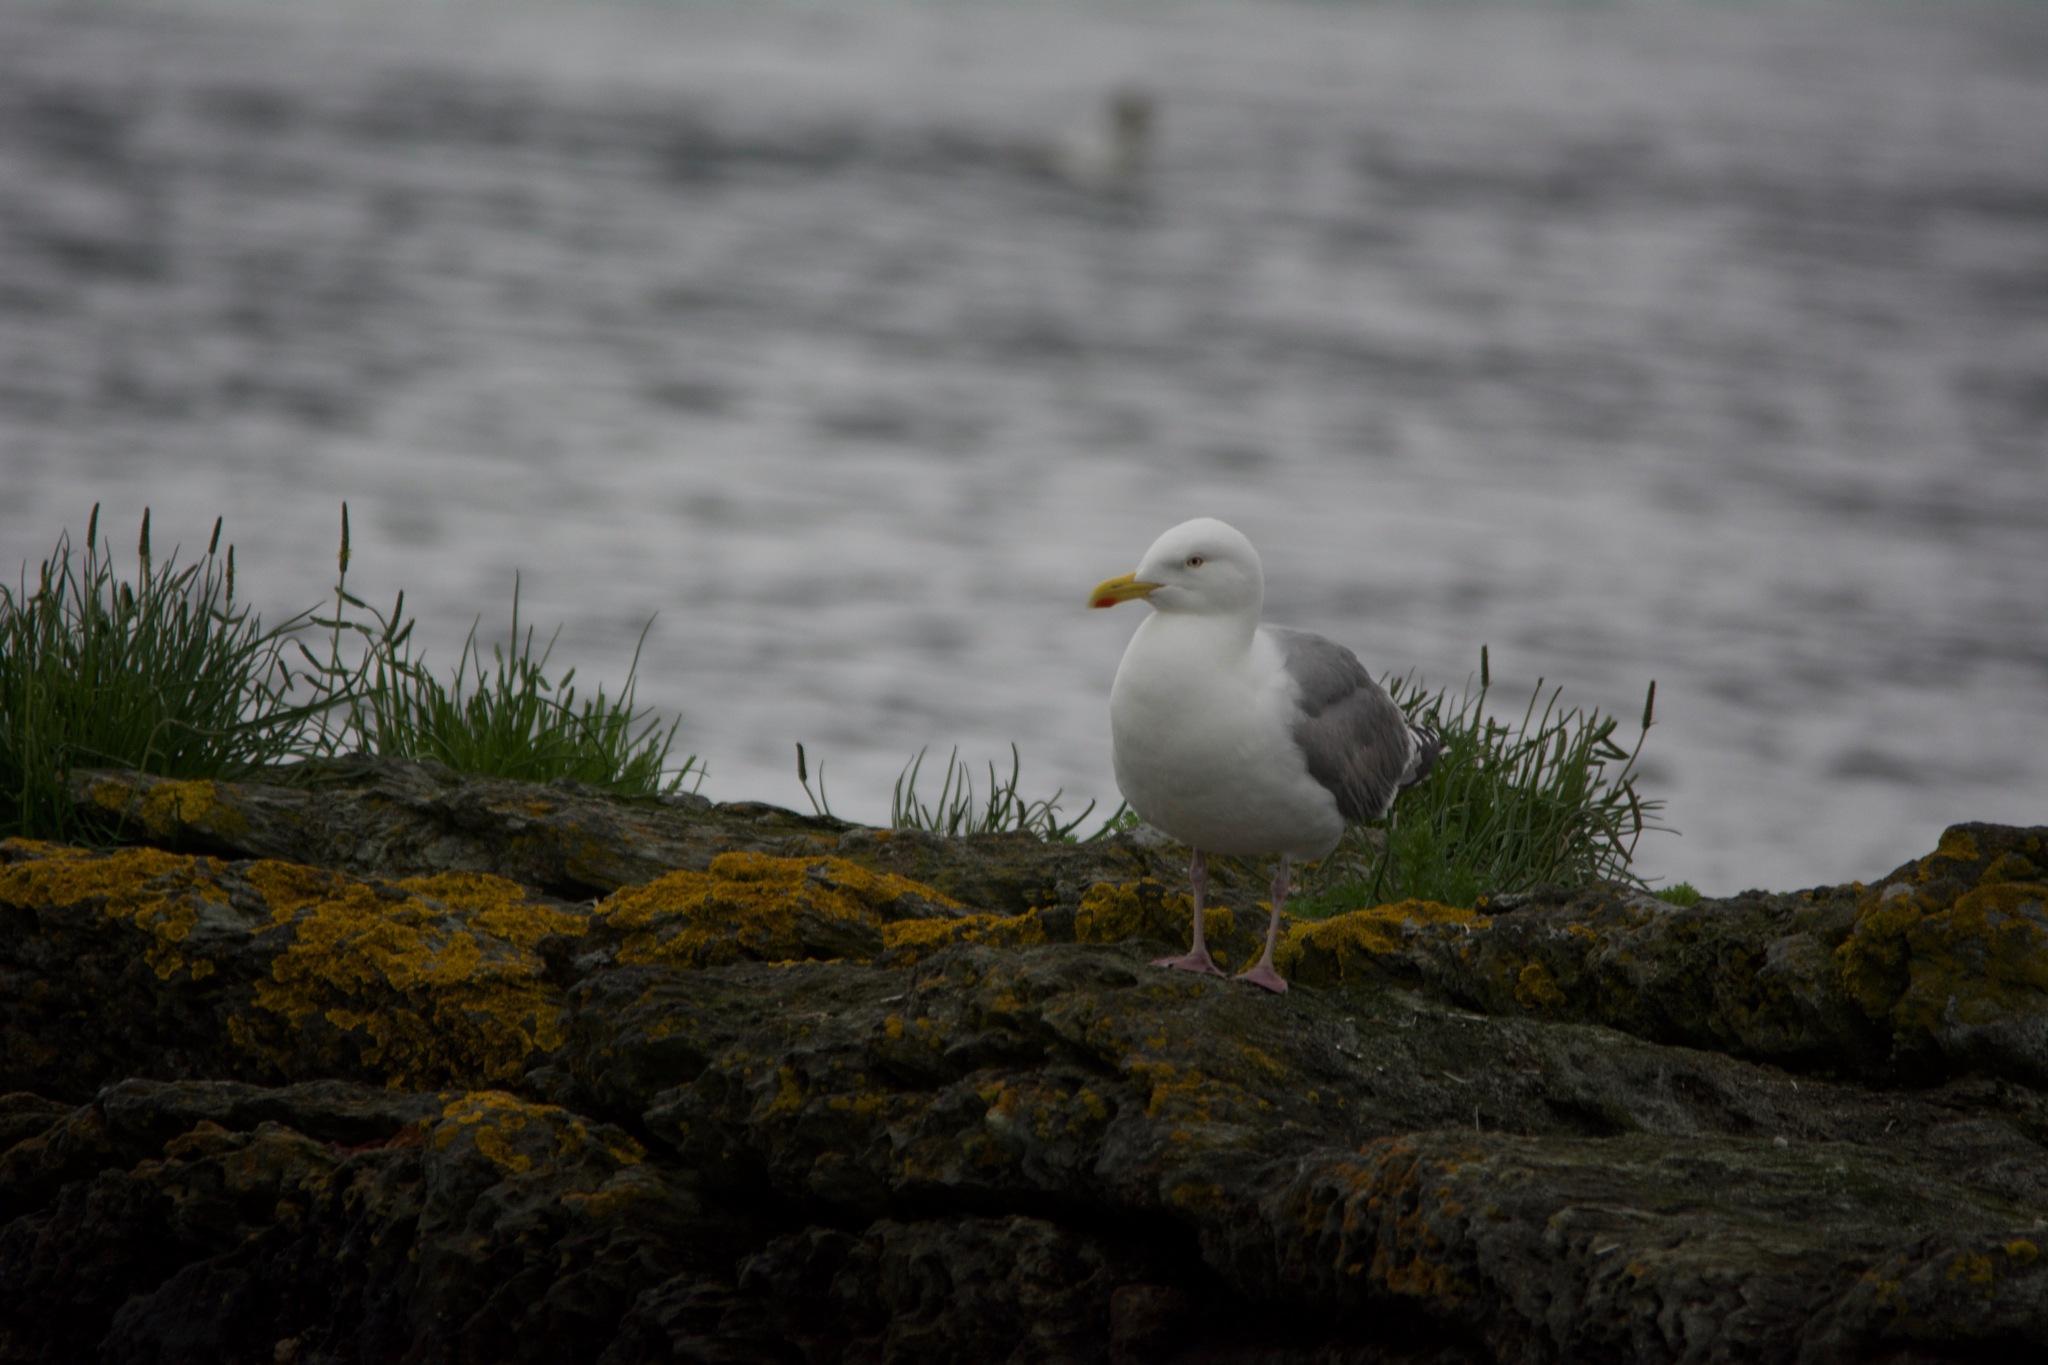 Seagull Spying 1.003 by Lars-Toralf Utnes Storstrand